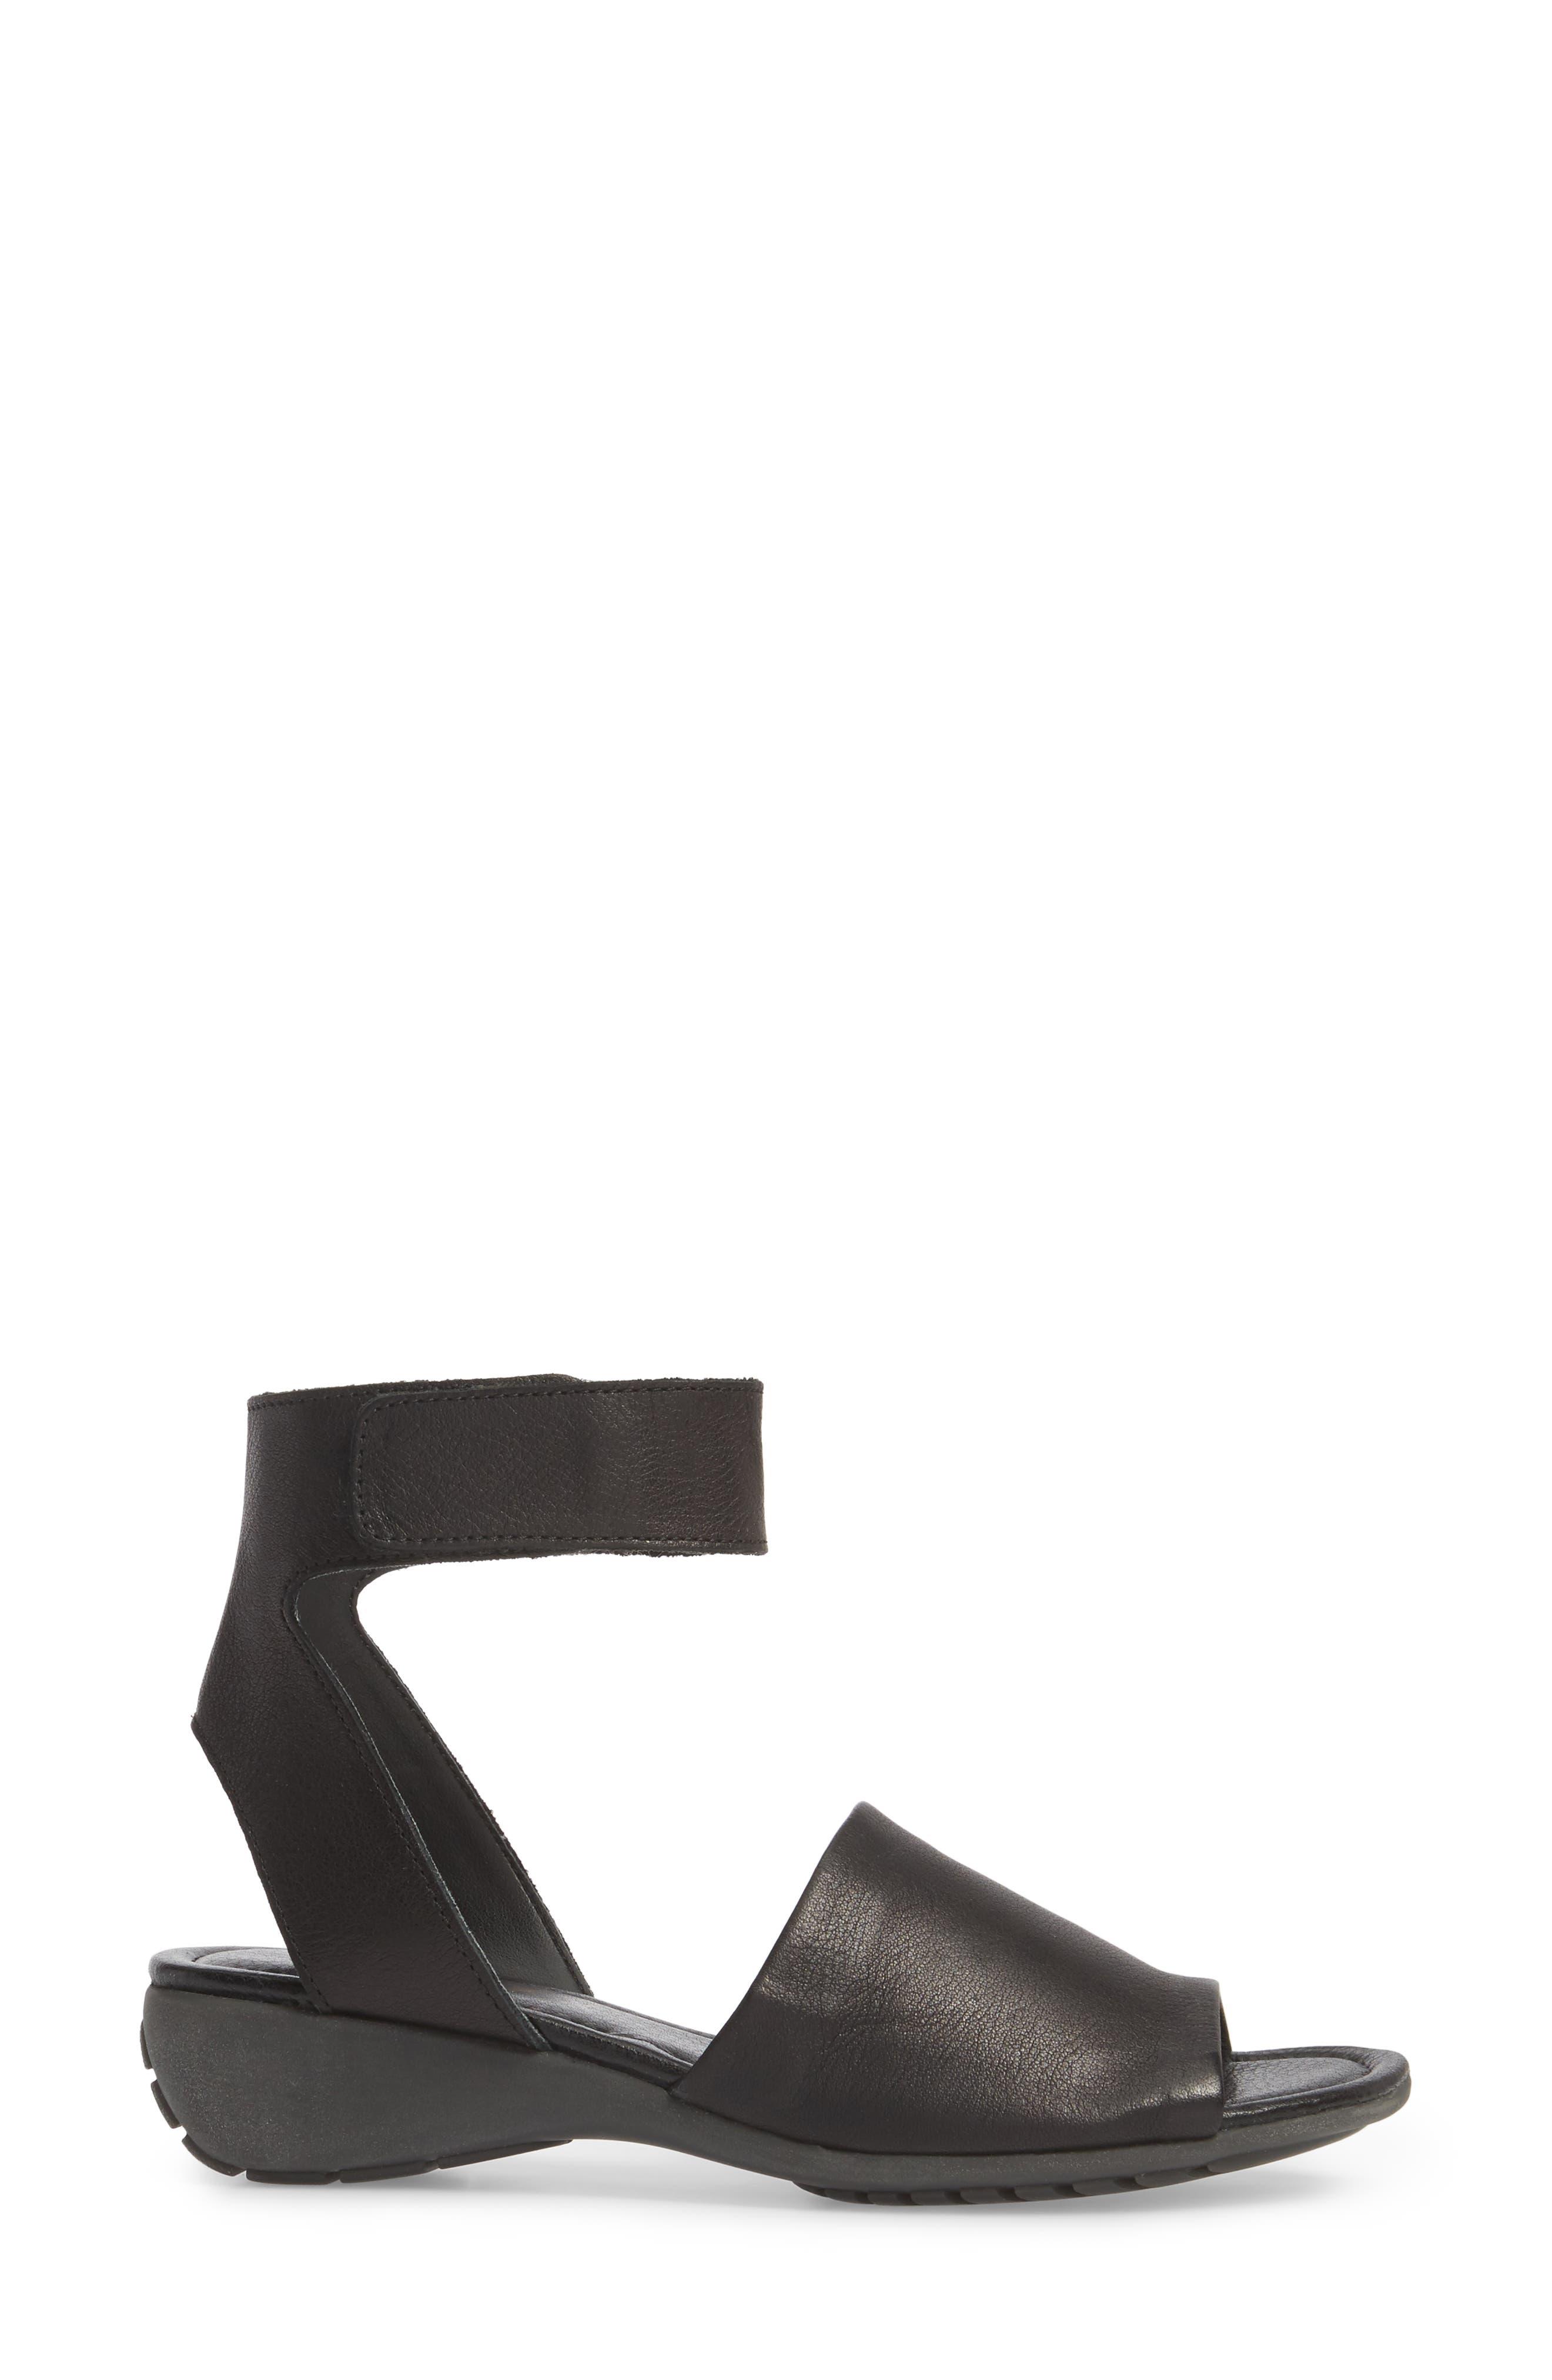 'Beglad' Leather Ankle Strap Sandal,                             Alternate thumbnail 33, color,